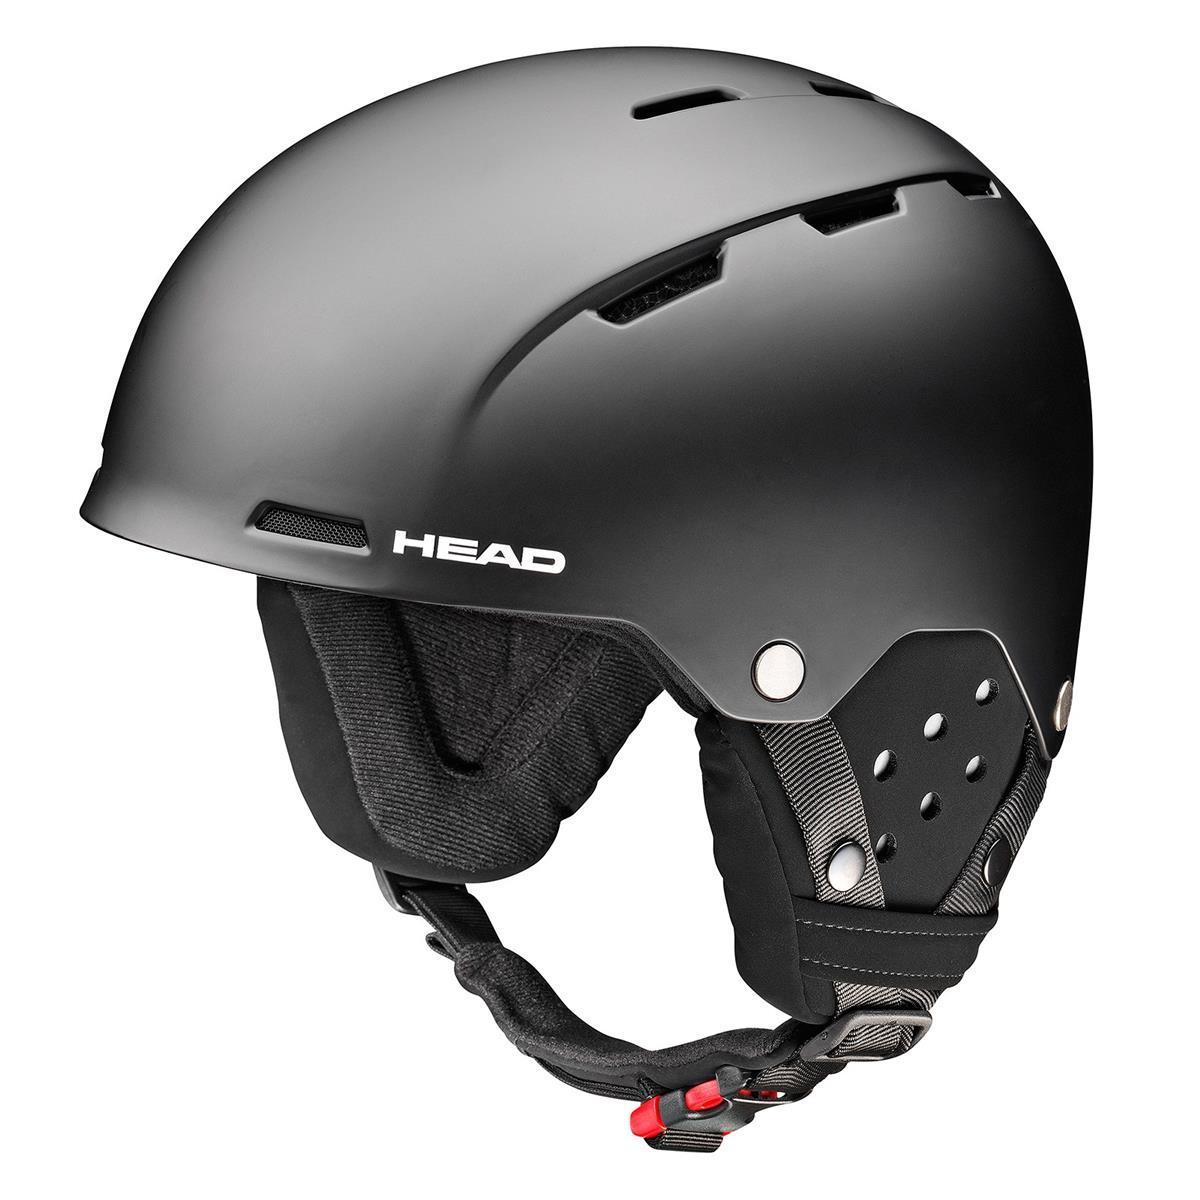 842a86f64 Helmets - Ski and Bikes